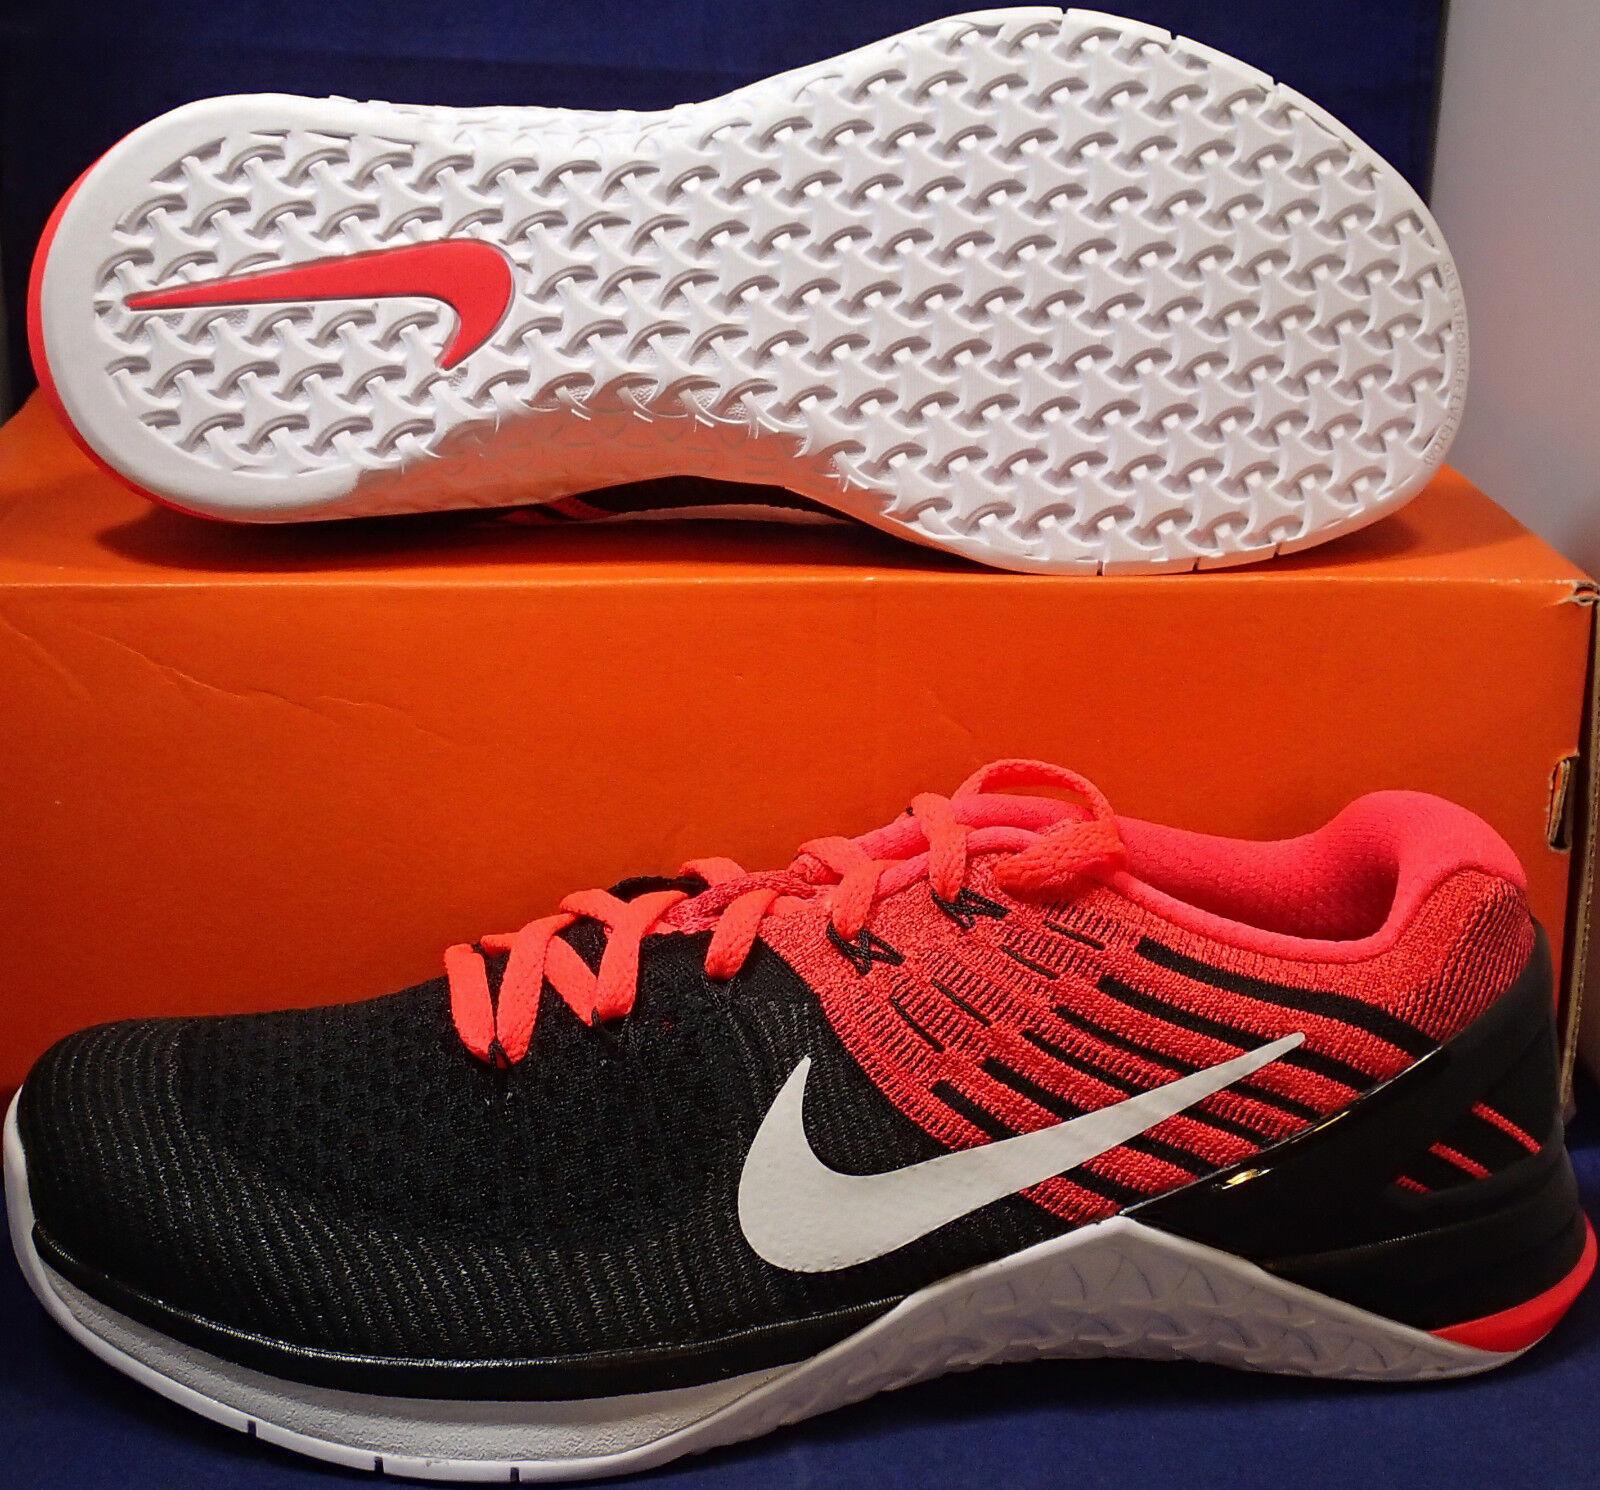 Nike Metcon 3 DSX Flyknit Black Bright Crimson CrossFit SZ 10.5 ( 852930-009 )